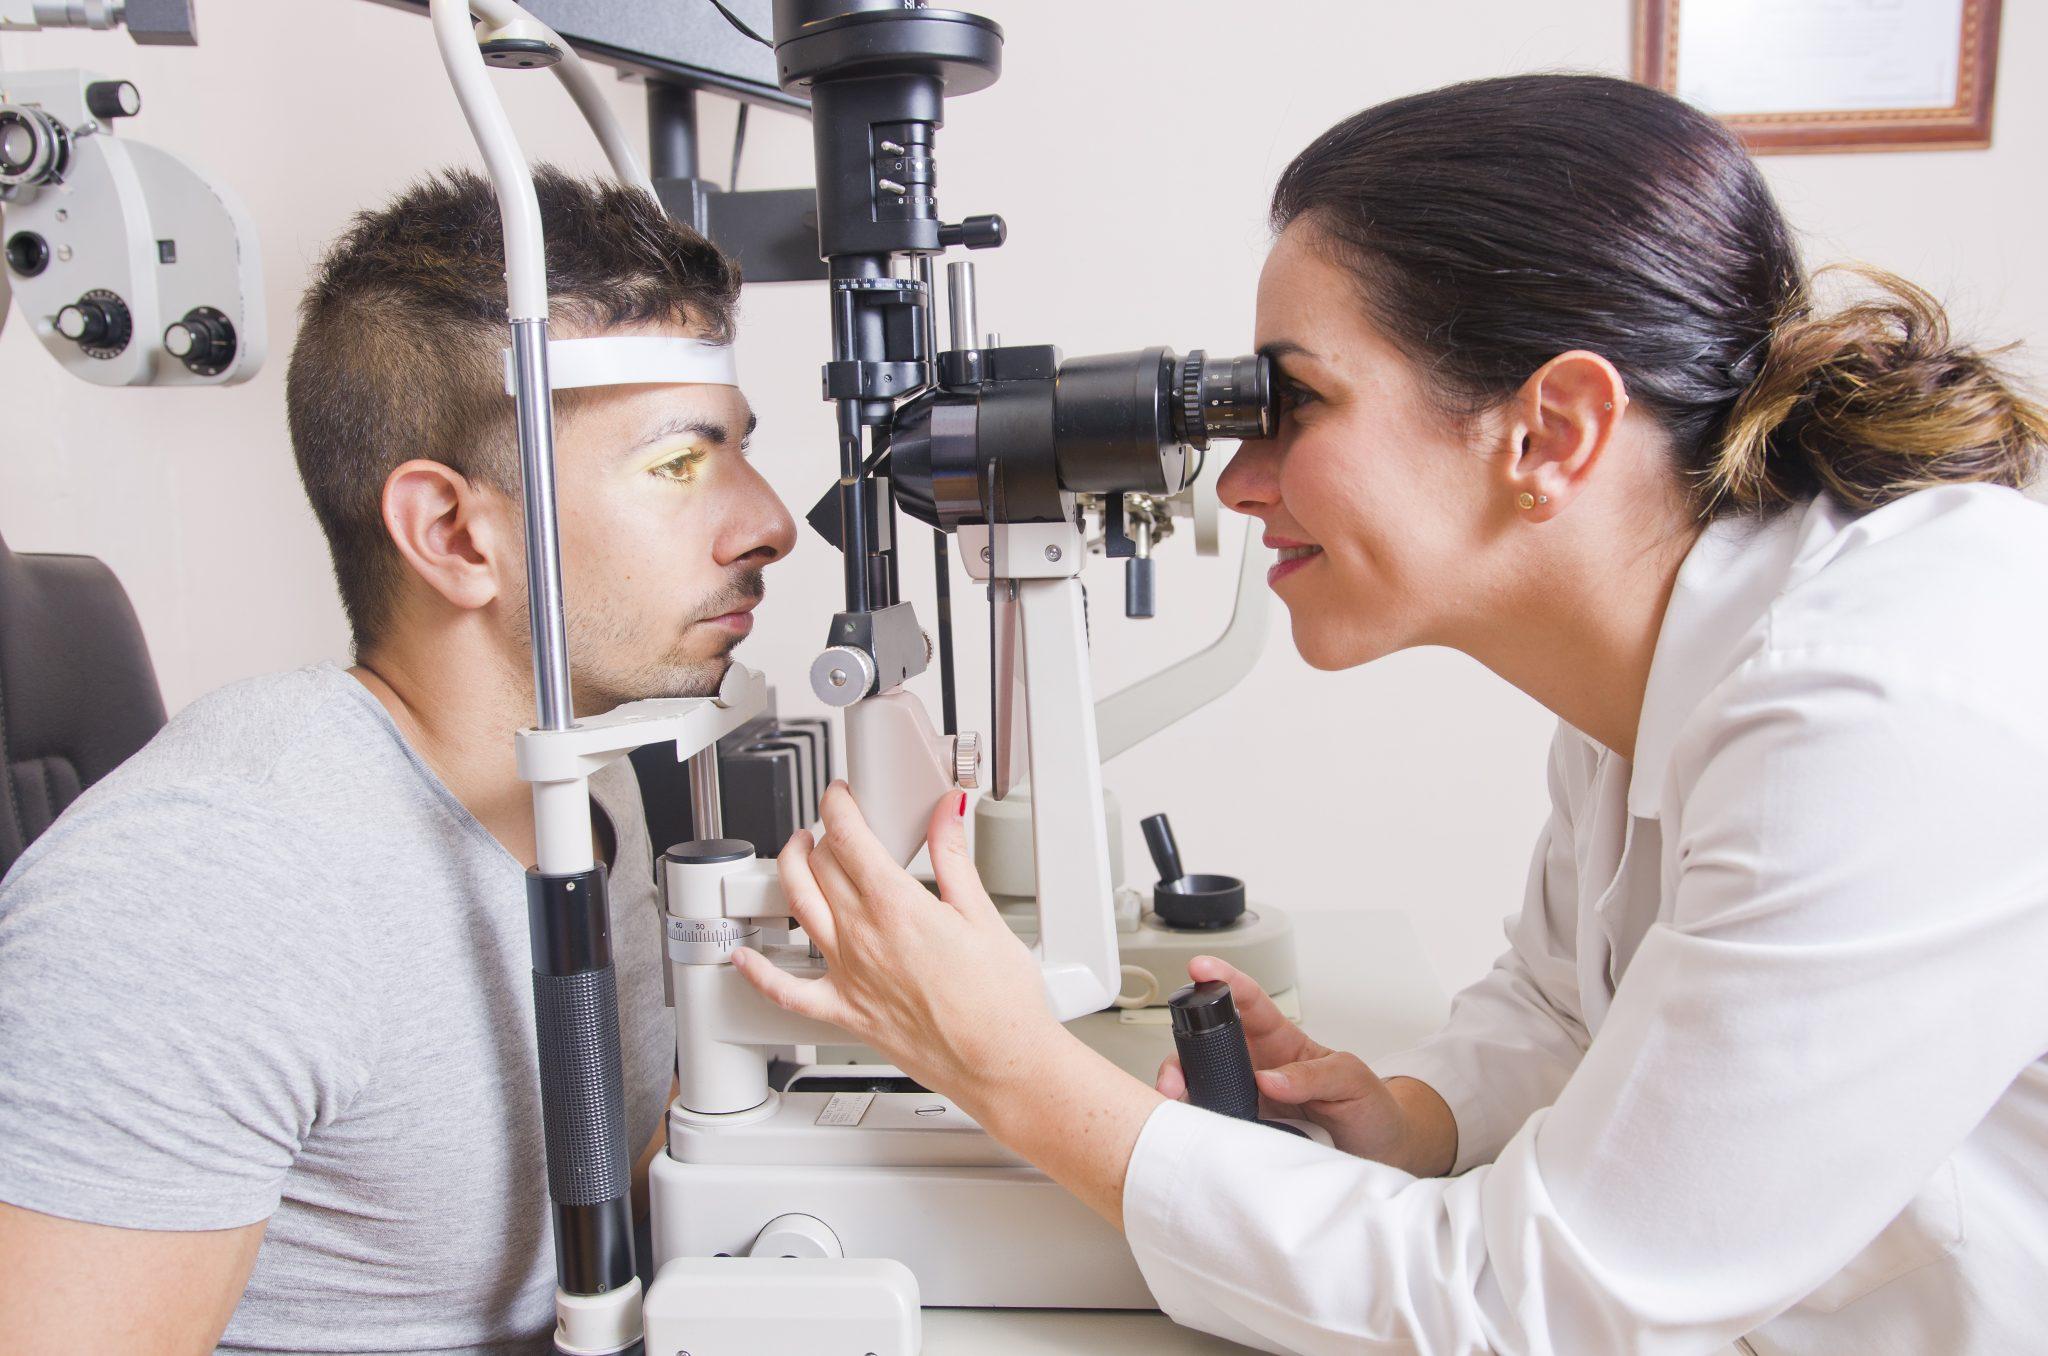 glaucoma-eye-exam-isight-optometry-3